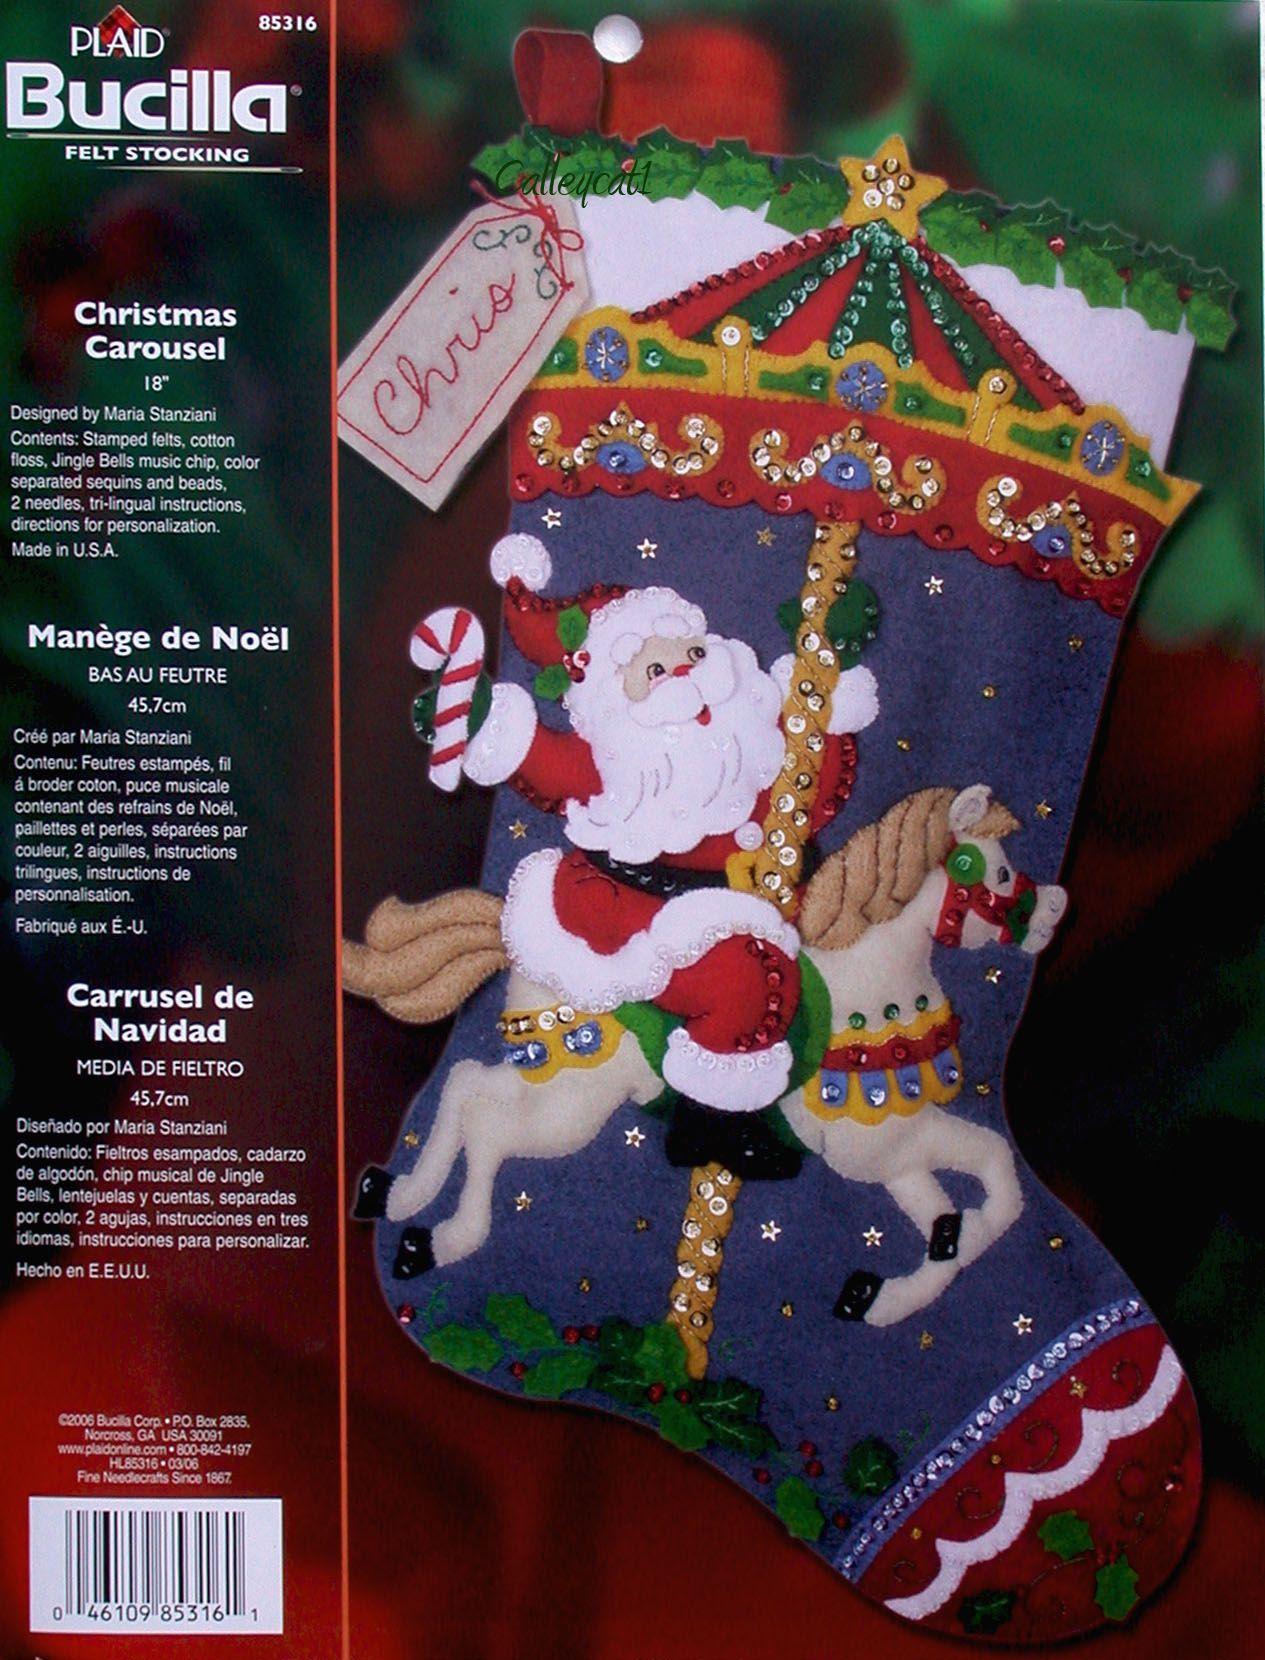 bucilla stocking kits - Google Search   crafts   Pinterest   Botas y ...